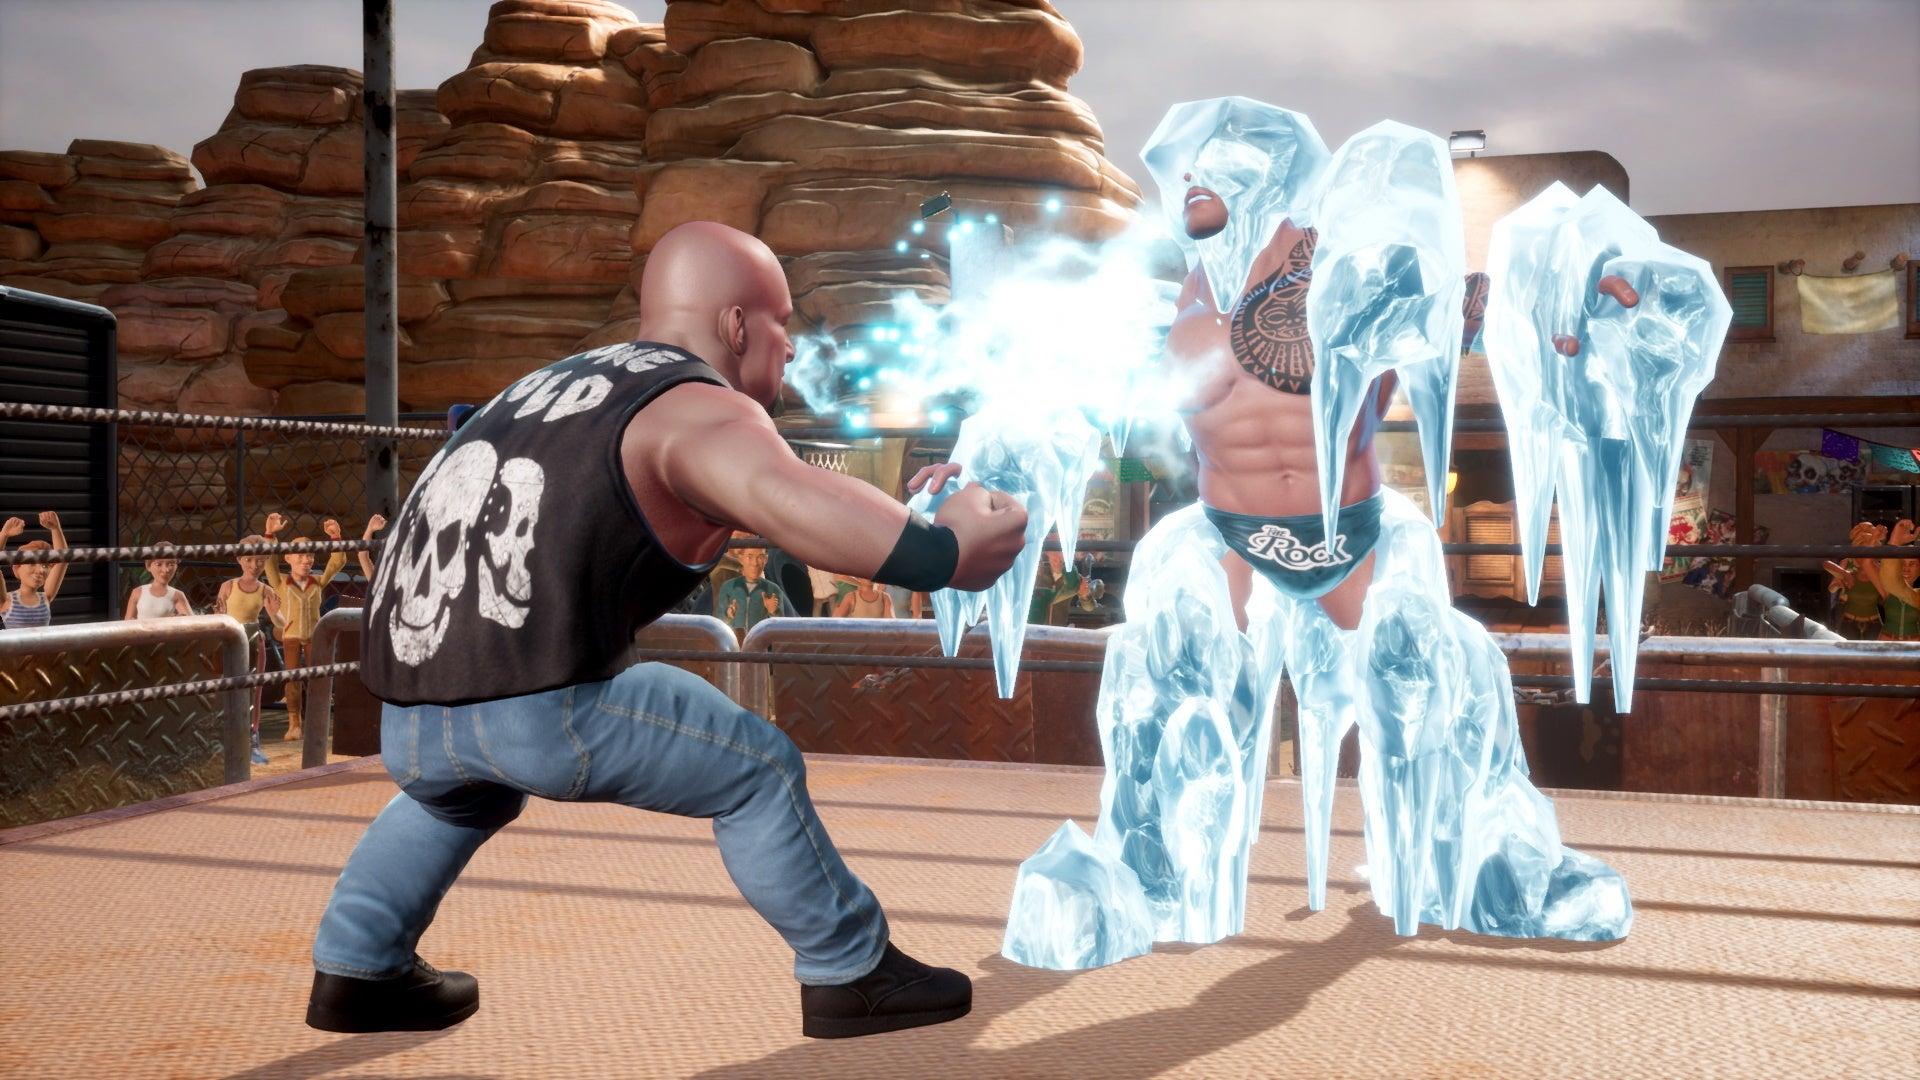 wwe 2k battlegrounds stone cold steve austin ice attack